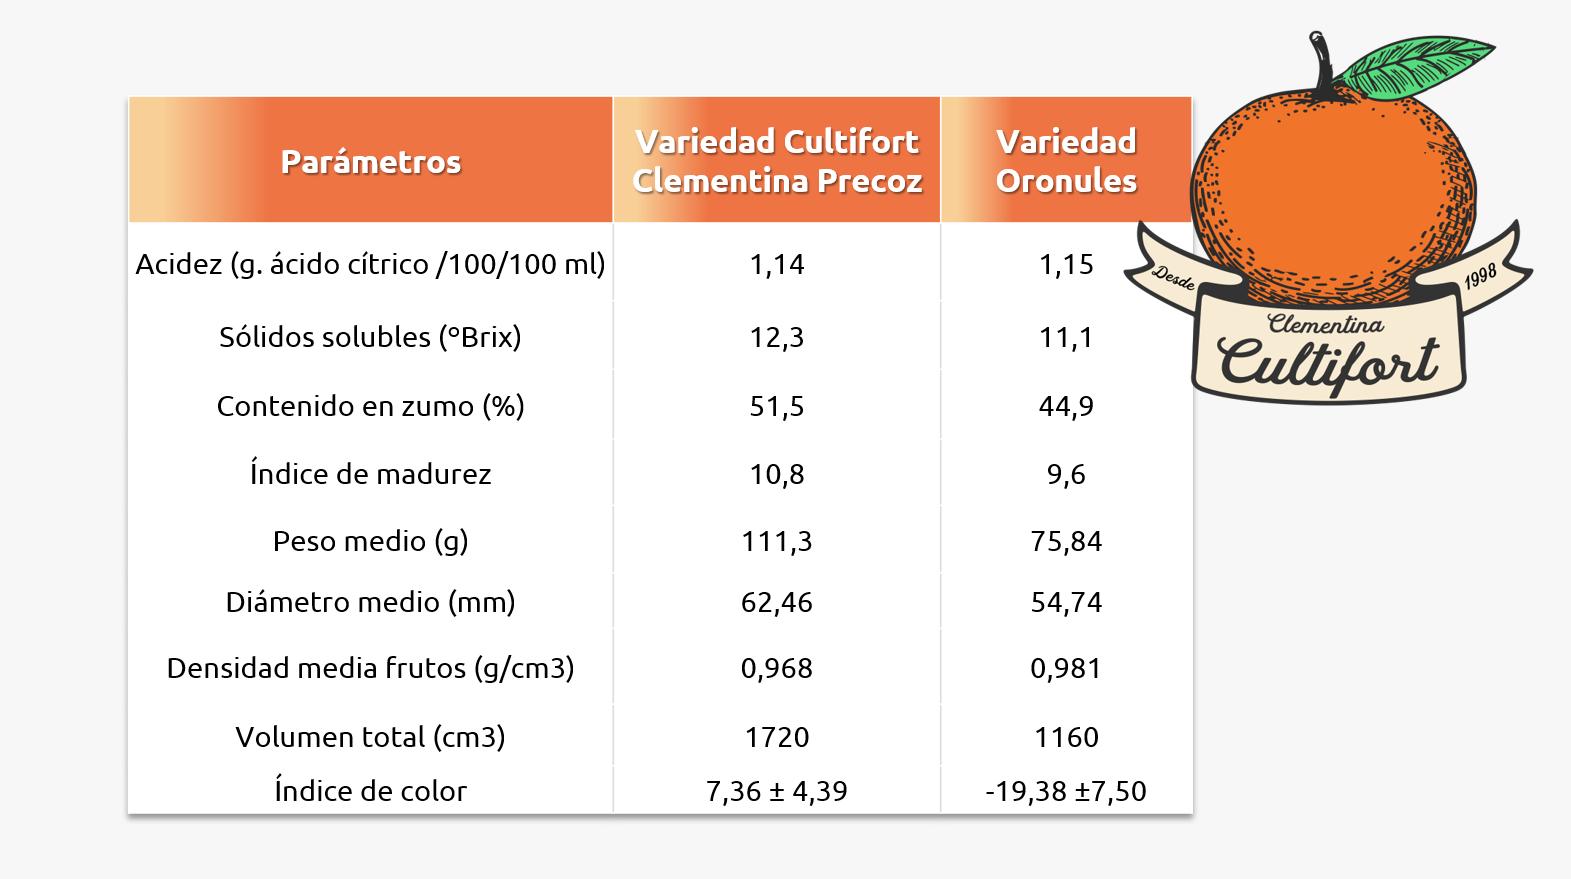 Tabla Cultifort Clementina Precoz